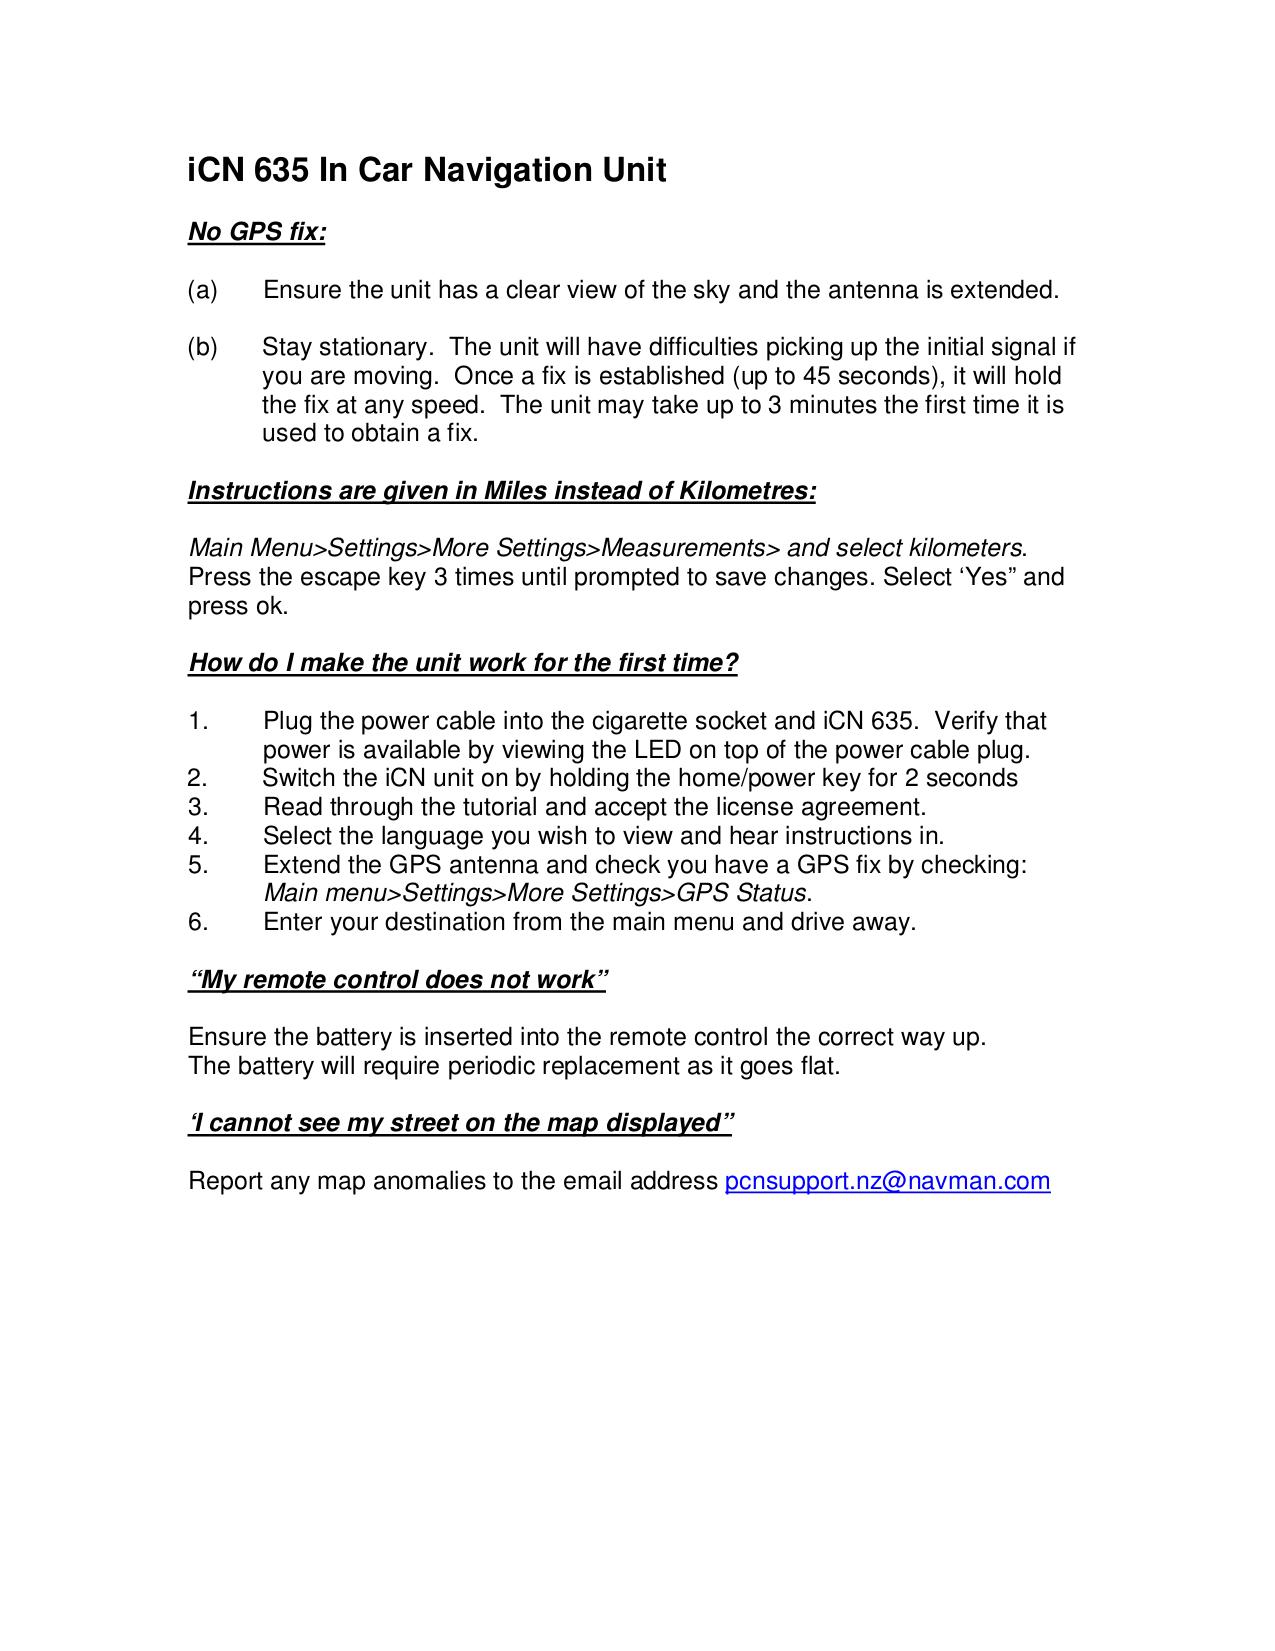 pdf for Navman GPS iCN635 manual